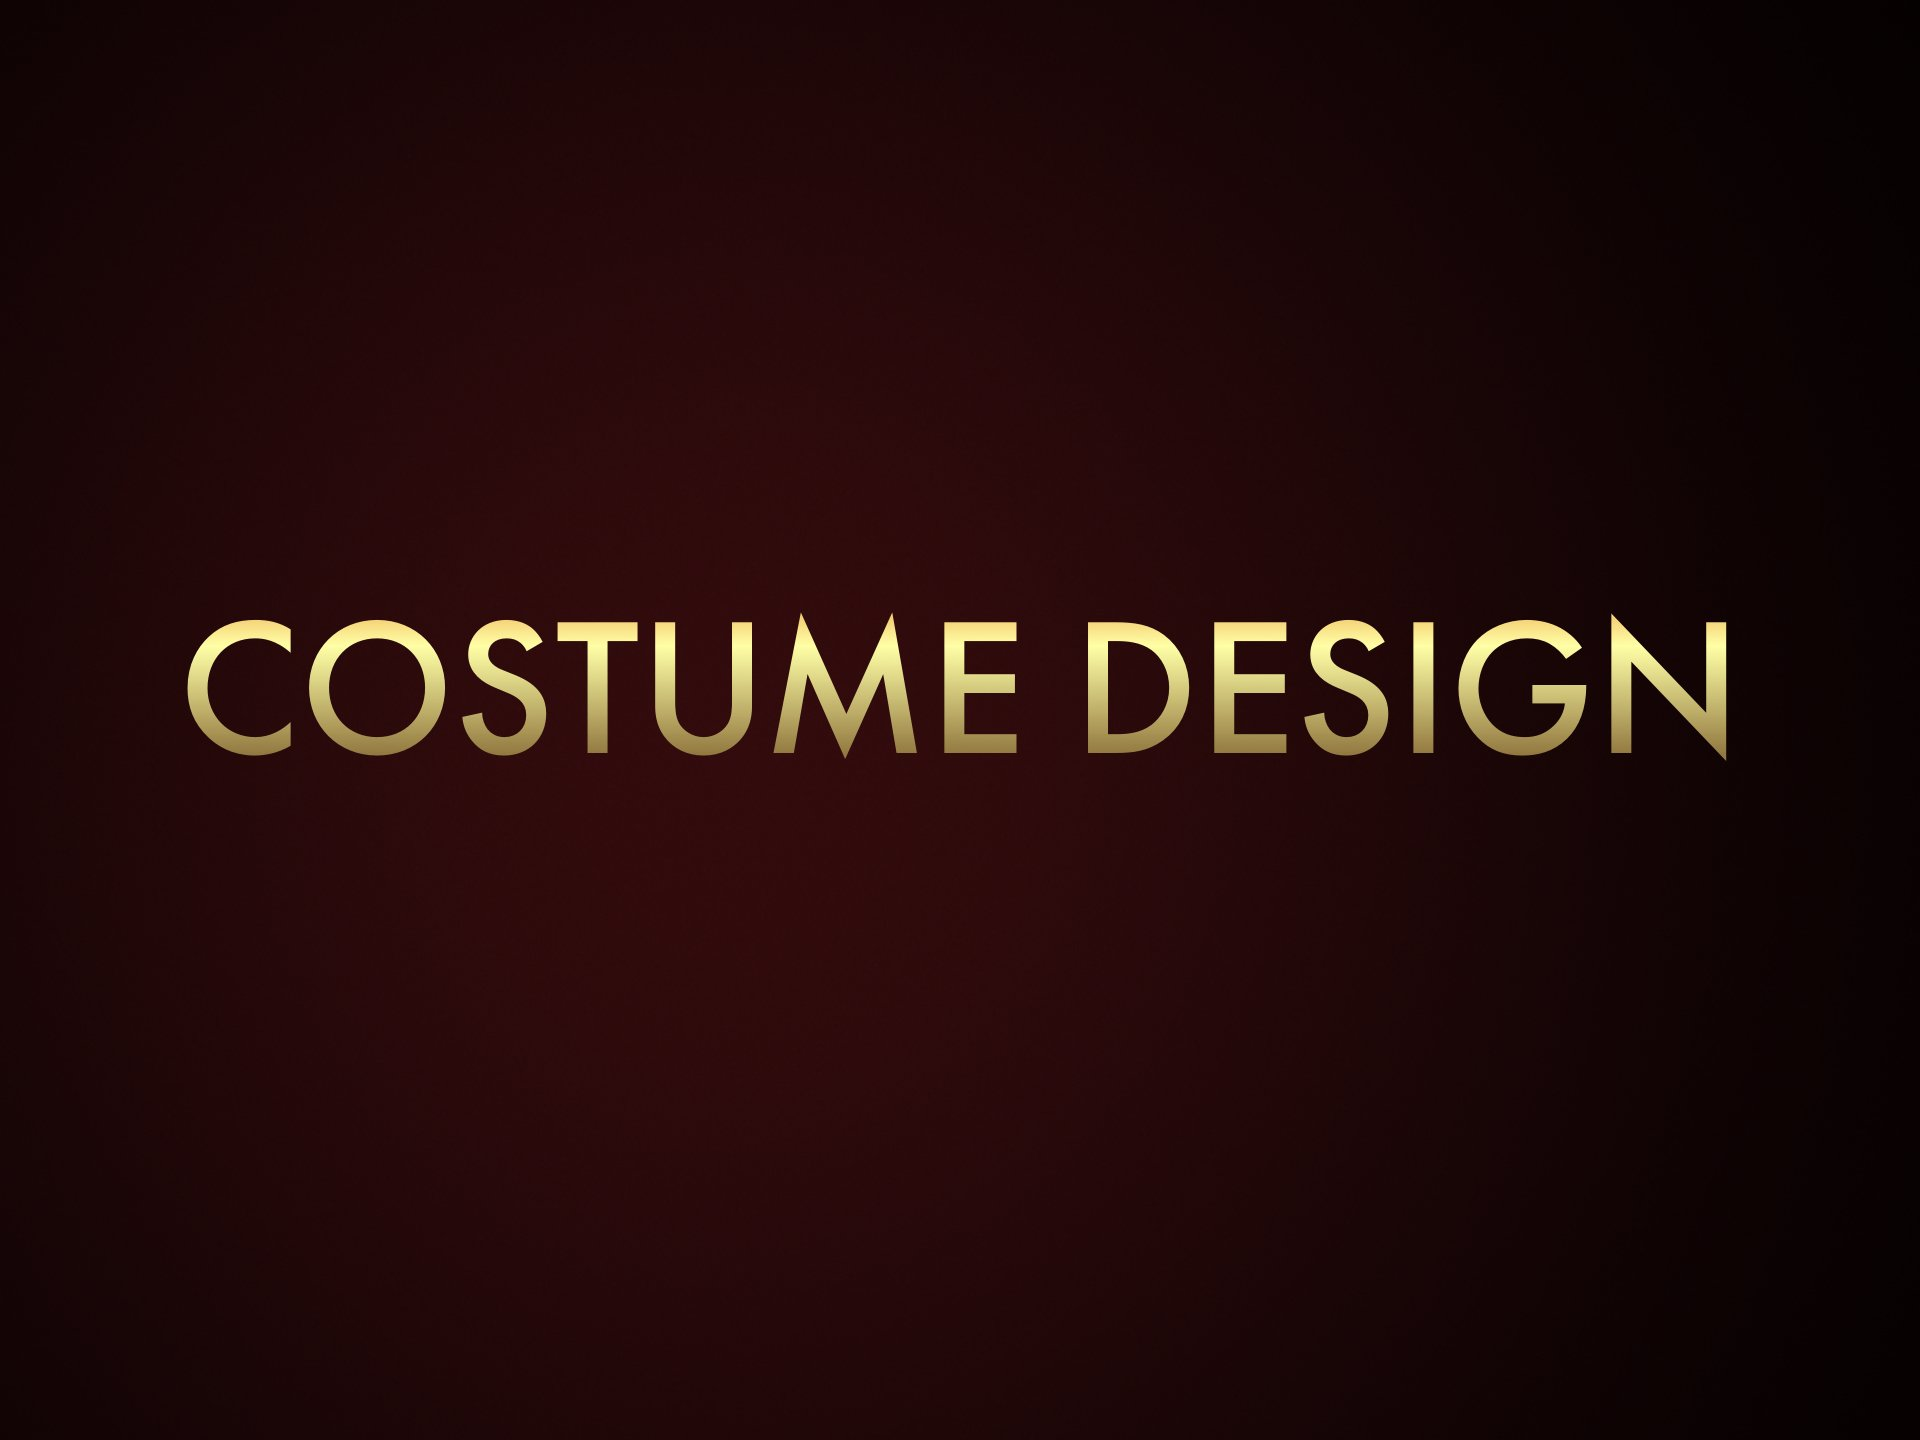 Costume Design Oscar Nominations 2020 Oscars 2020 News 92nd Academy Awards